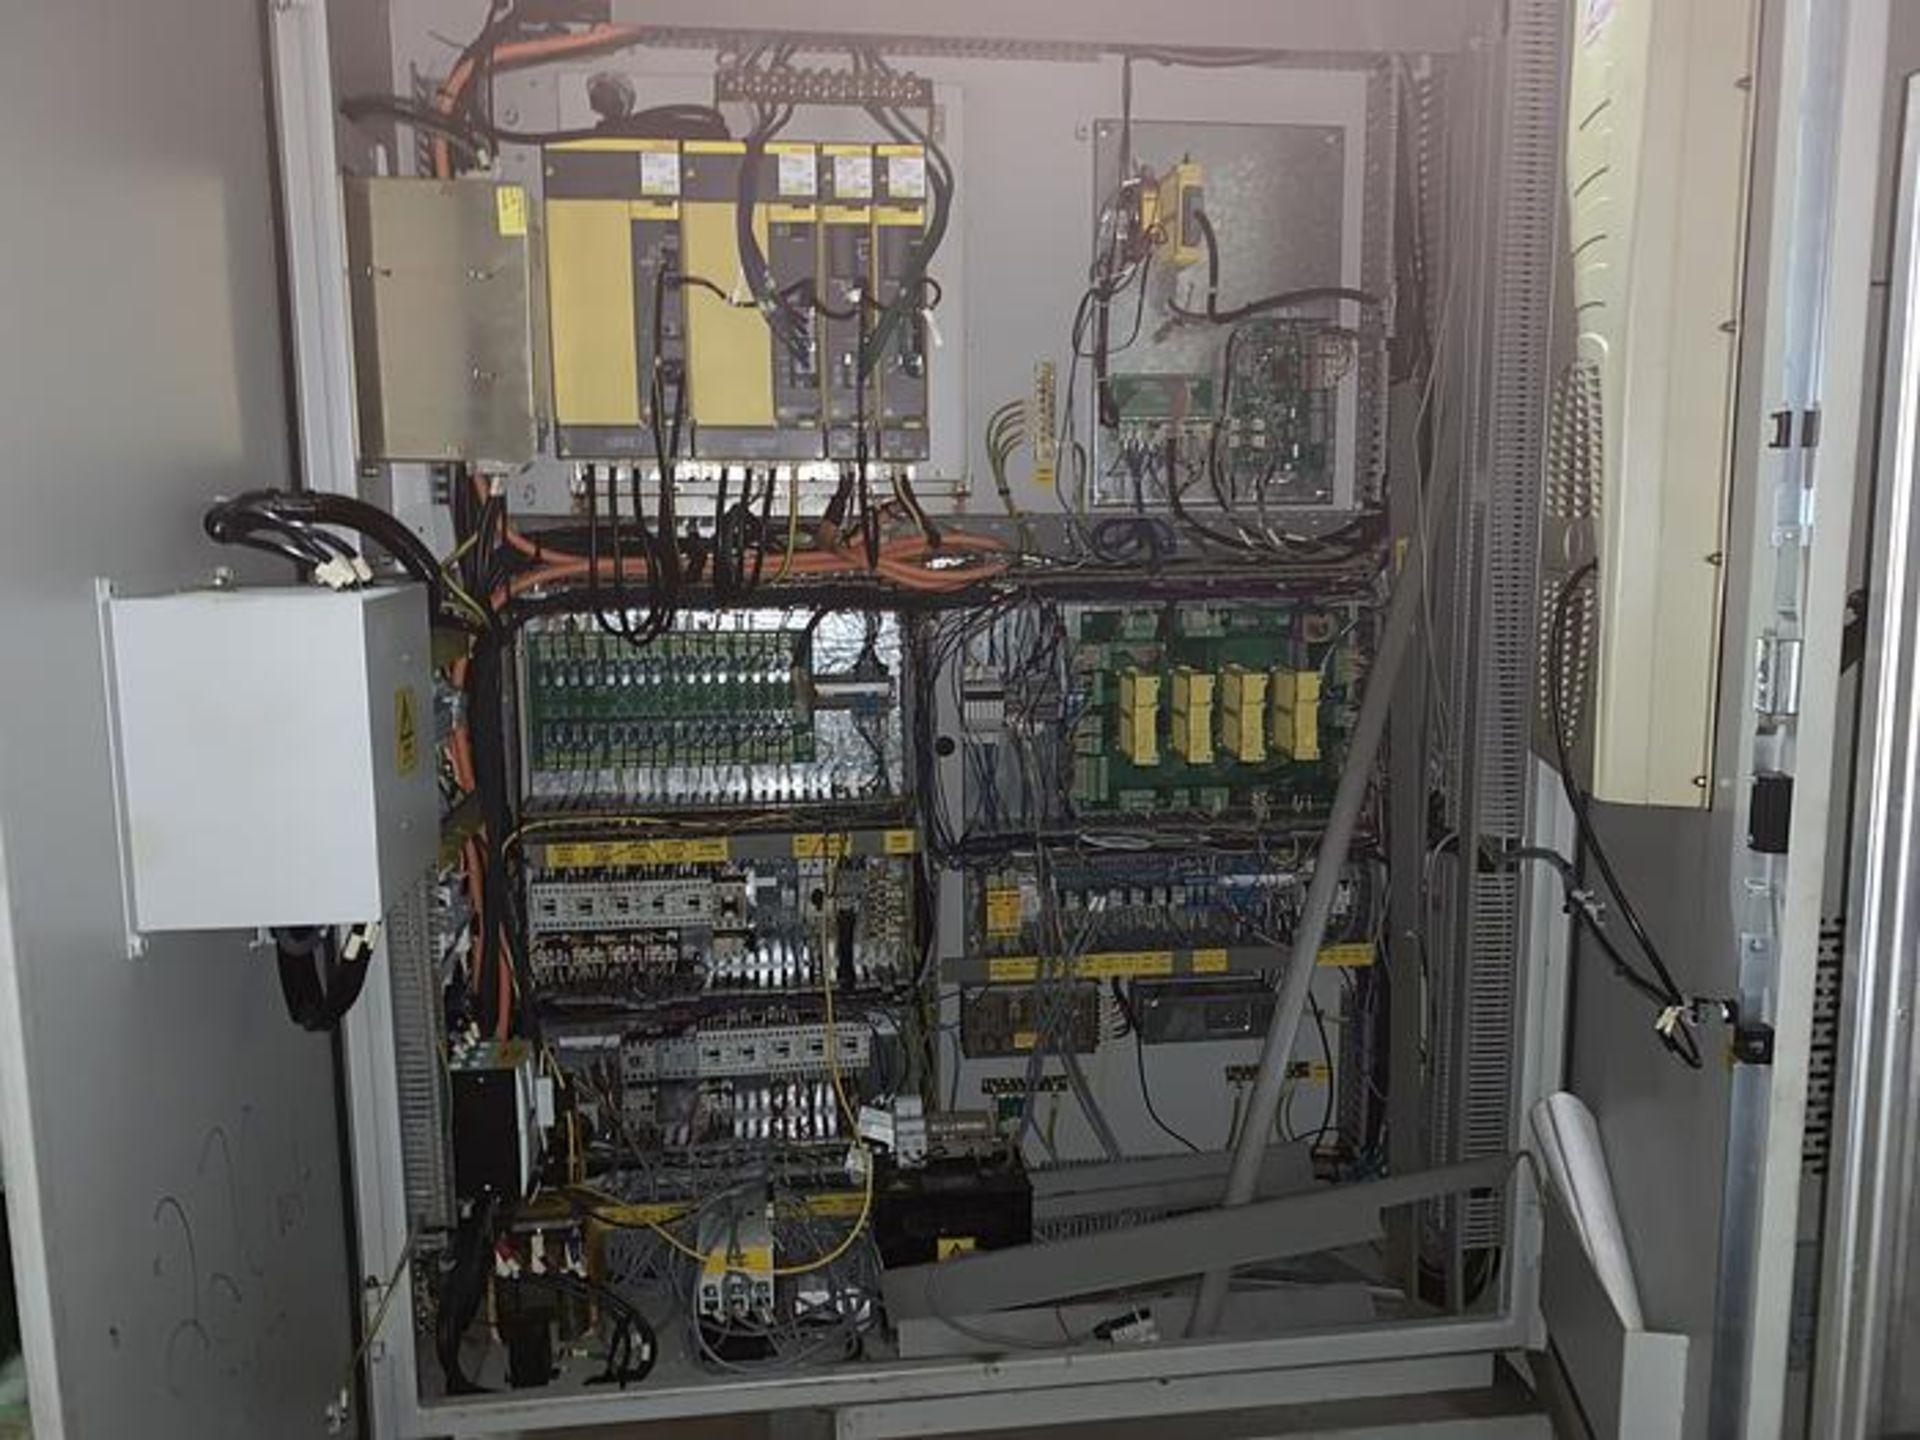 "HARDINGE XR760 CNC VMC PRODUCTION CENTER 30""X24""X24"", YEAR 2010, SN XRAB0A0001 - Image 7 of 12"